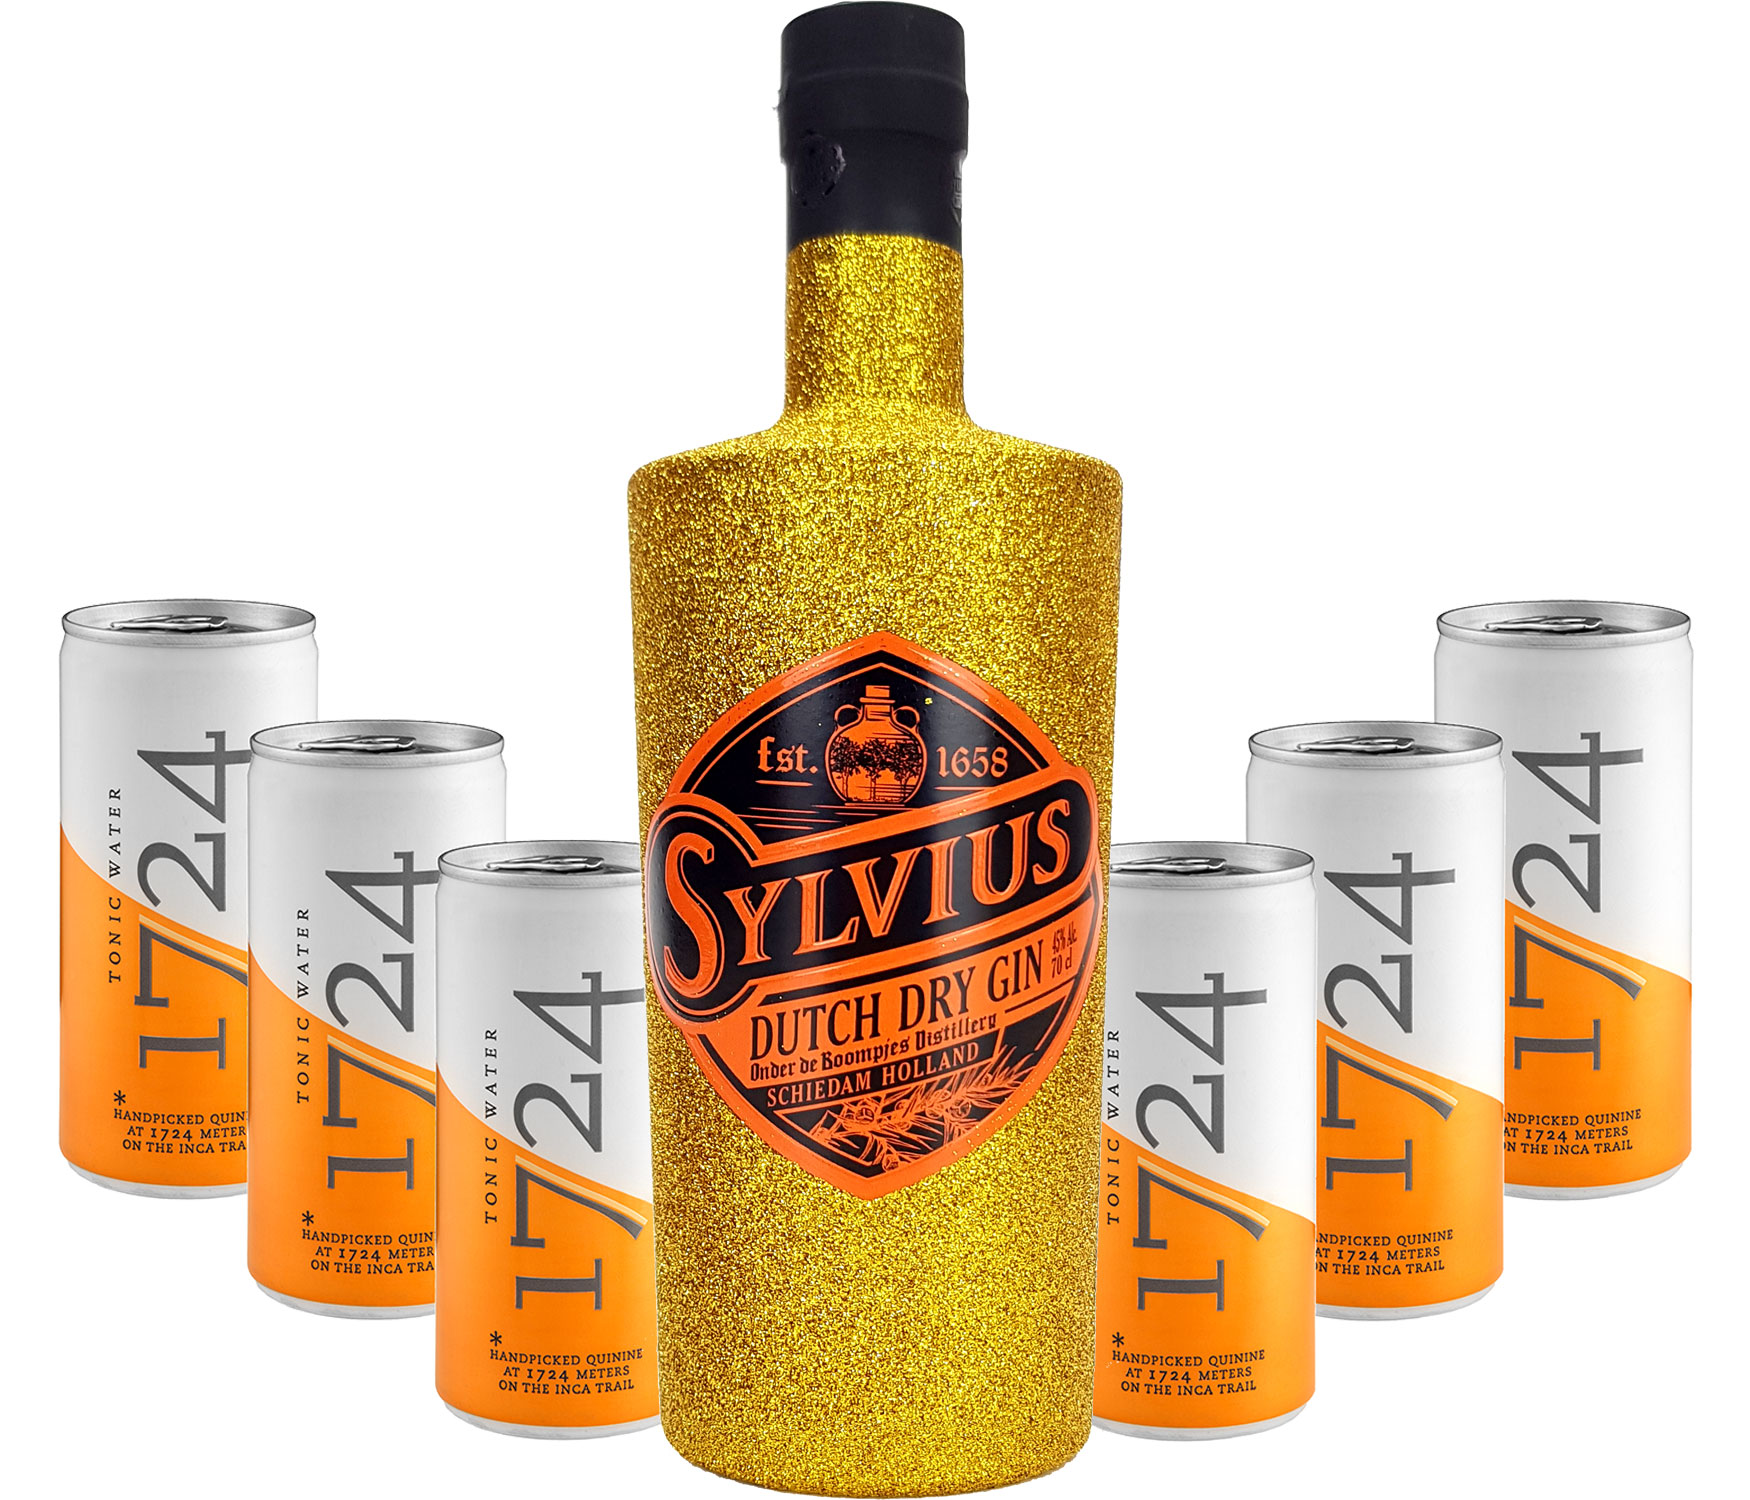 Gin Tonic Bling Bling Gold Glitzer Set Geschenkset - Sylvius Dutch Gin 0,7l 700ml (45% Vol) + 6x 1724 Tonic Water Dosen 200ml inkl. Pfand EINWEG -[Enthält Sulfite]